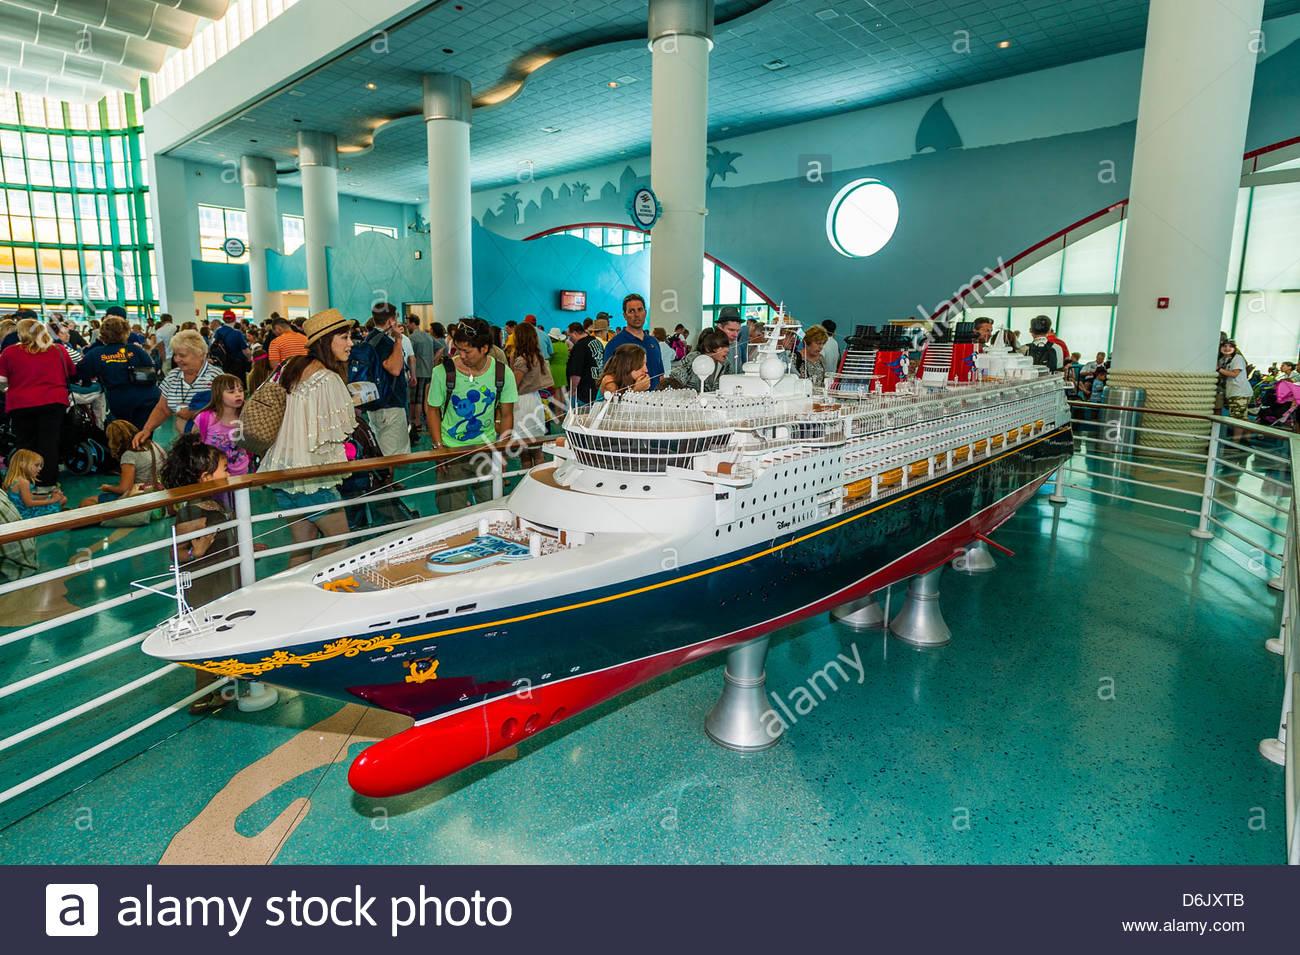 Model Of The New Disney Dream Cruise Ship Disney Cruise Line - Is disney building a new cruise ship